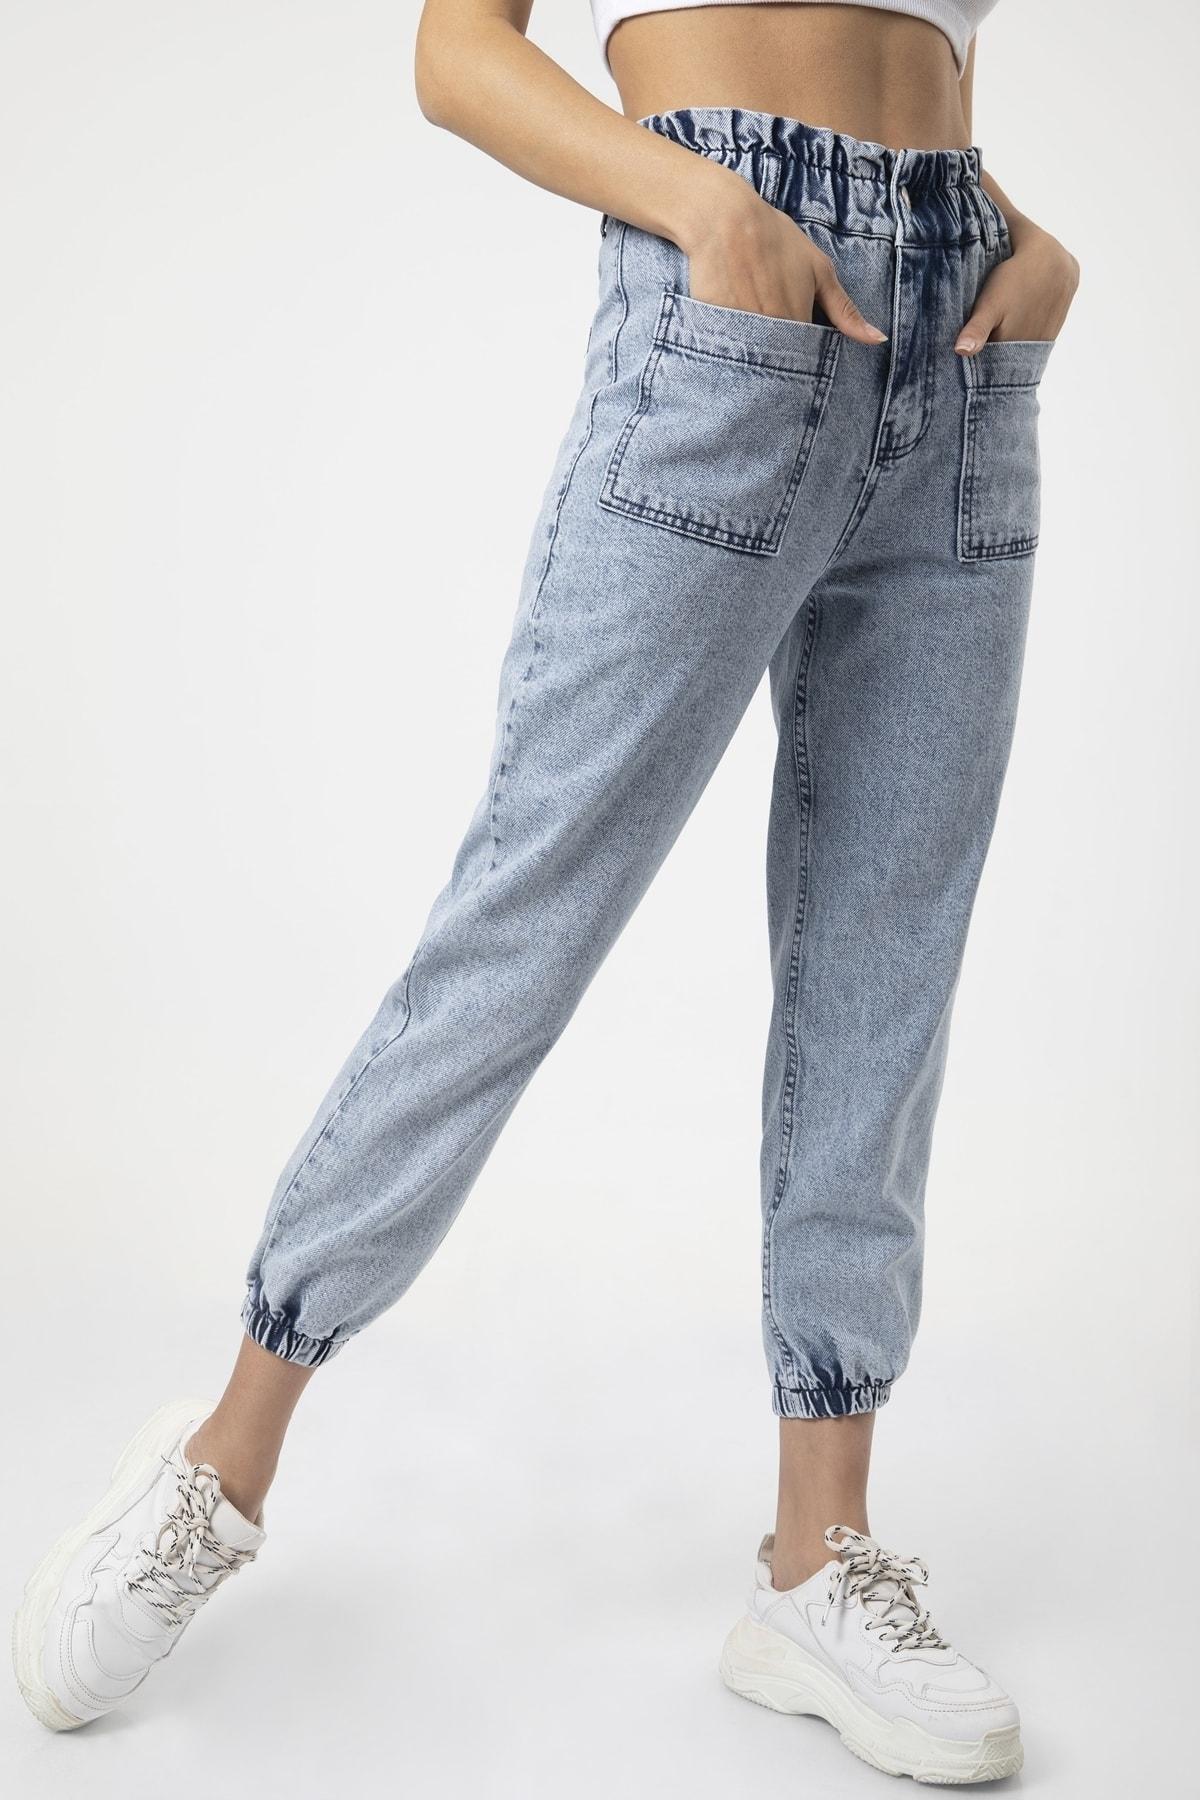 Kadın Mavi Cep Detaylı Paça Lastikli Salaş Kot Pantolon